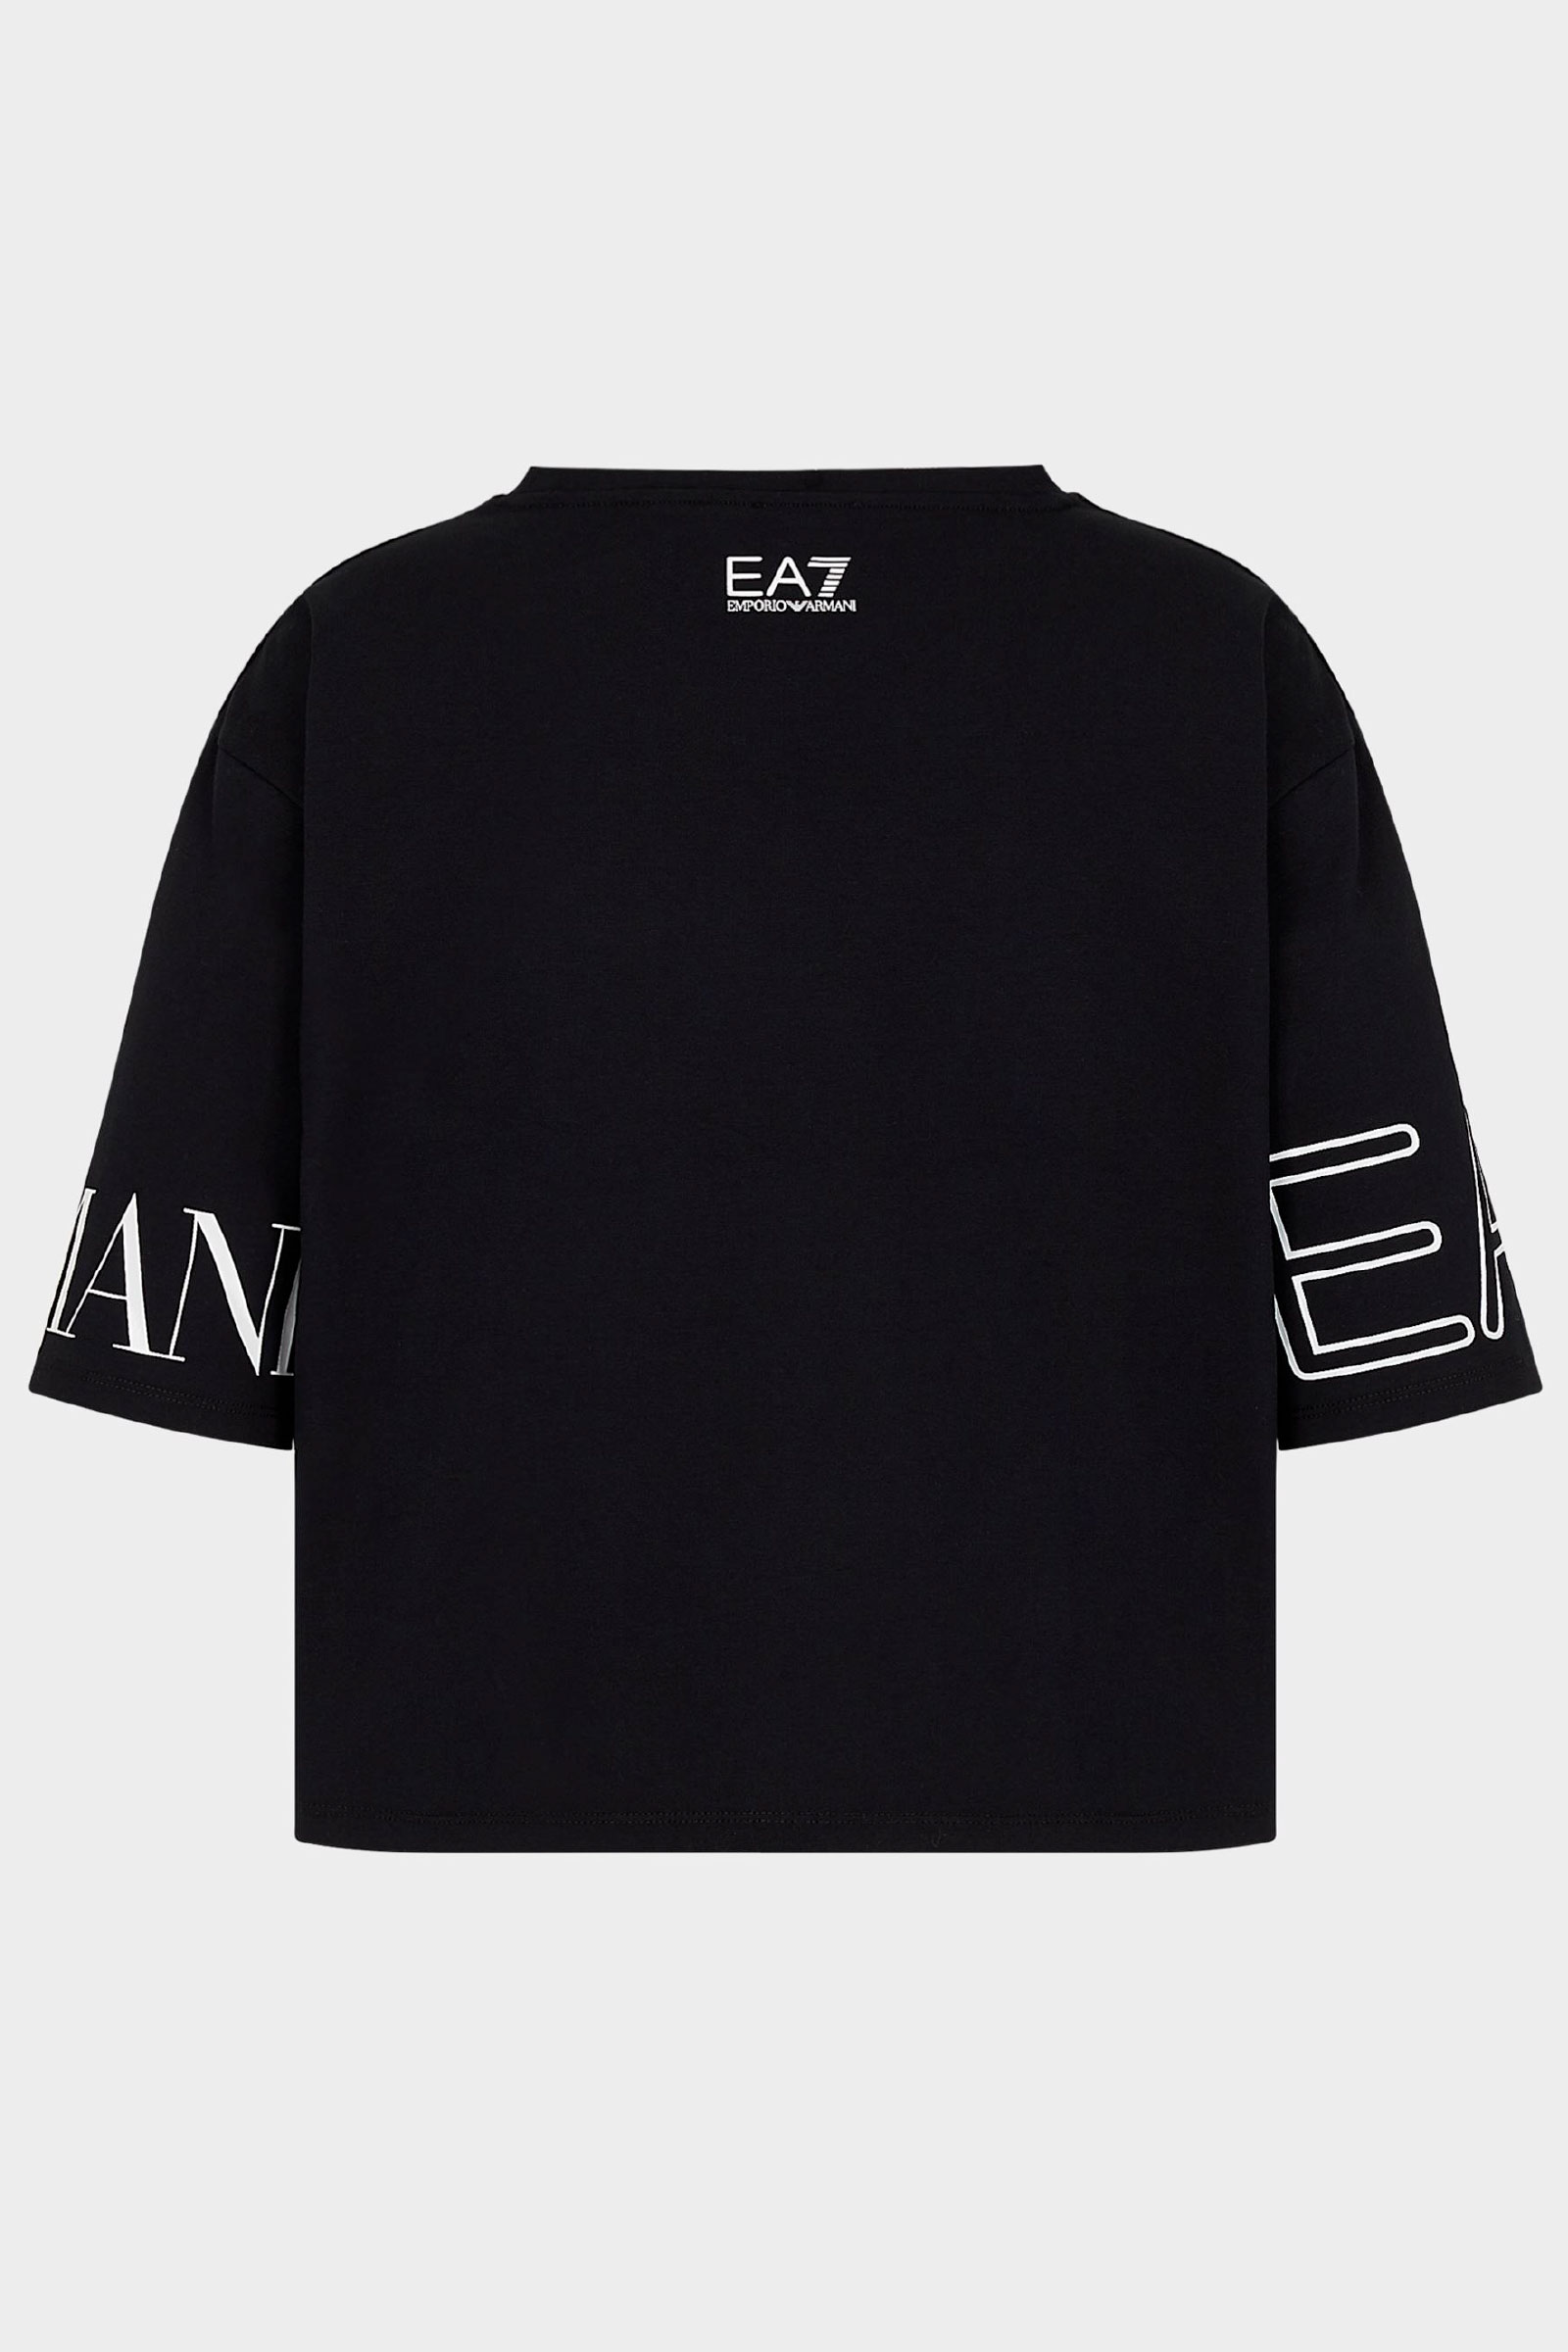 ARMANI EA7 Women's T-Shirt ARMANI EA7 | T-Shirt | 3KTT18 TJ29Z0200